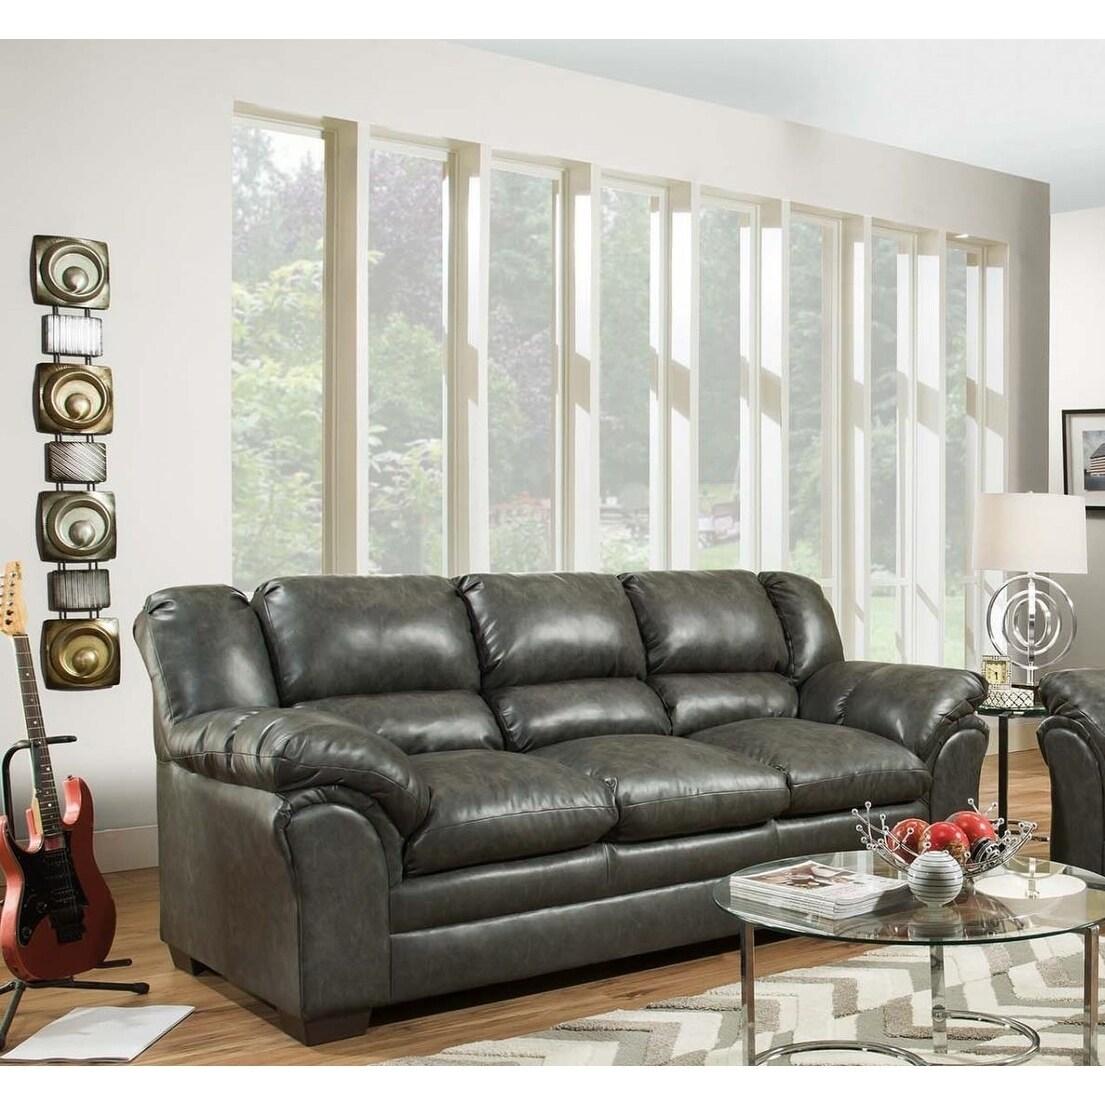 Sofatrendz Davenport Charcoal Sofa